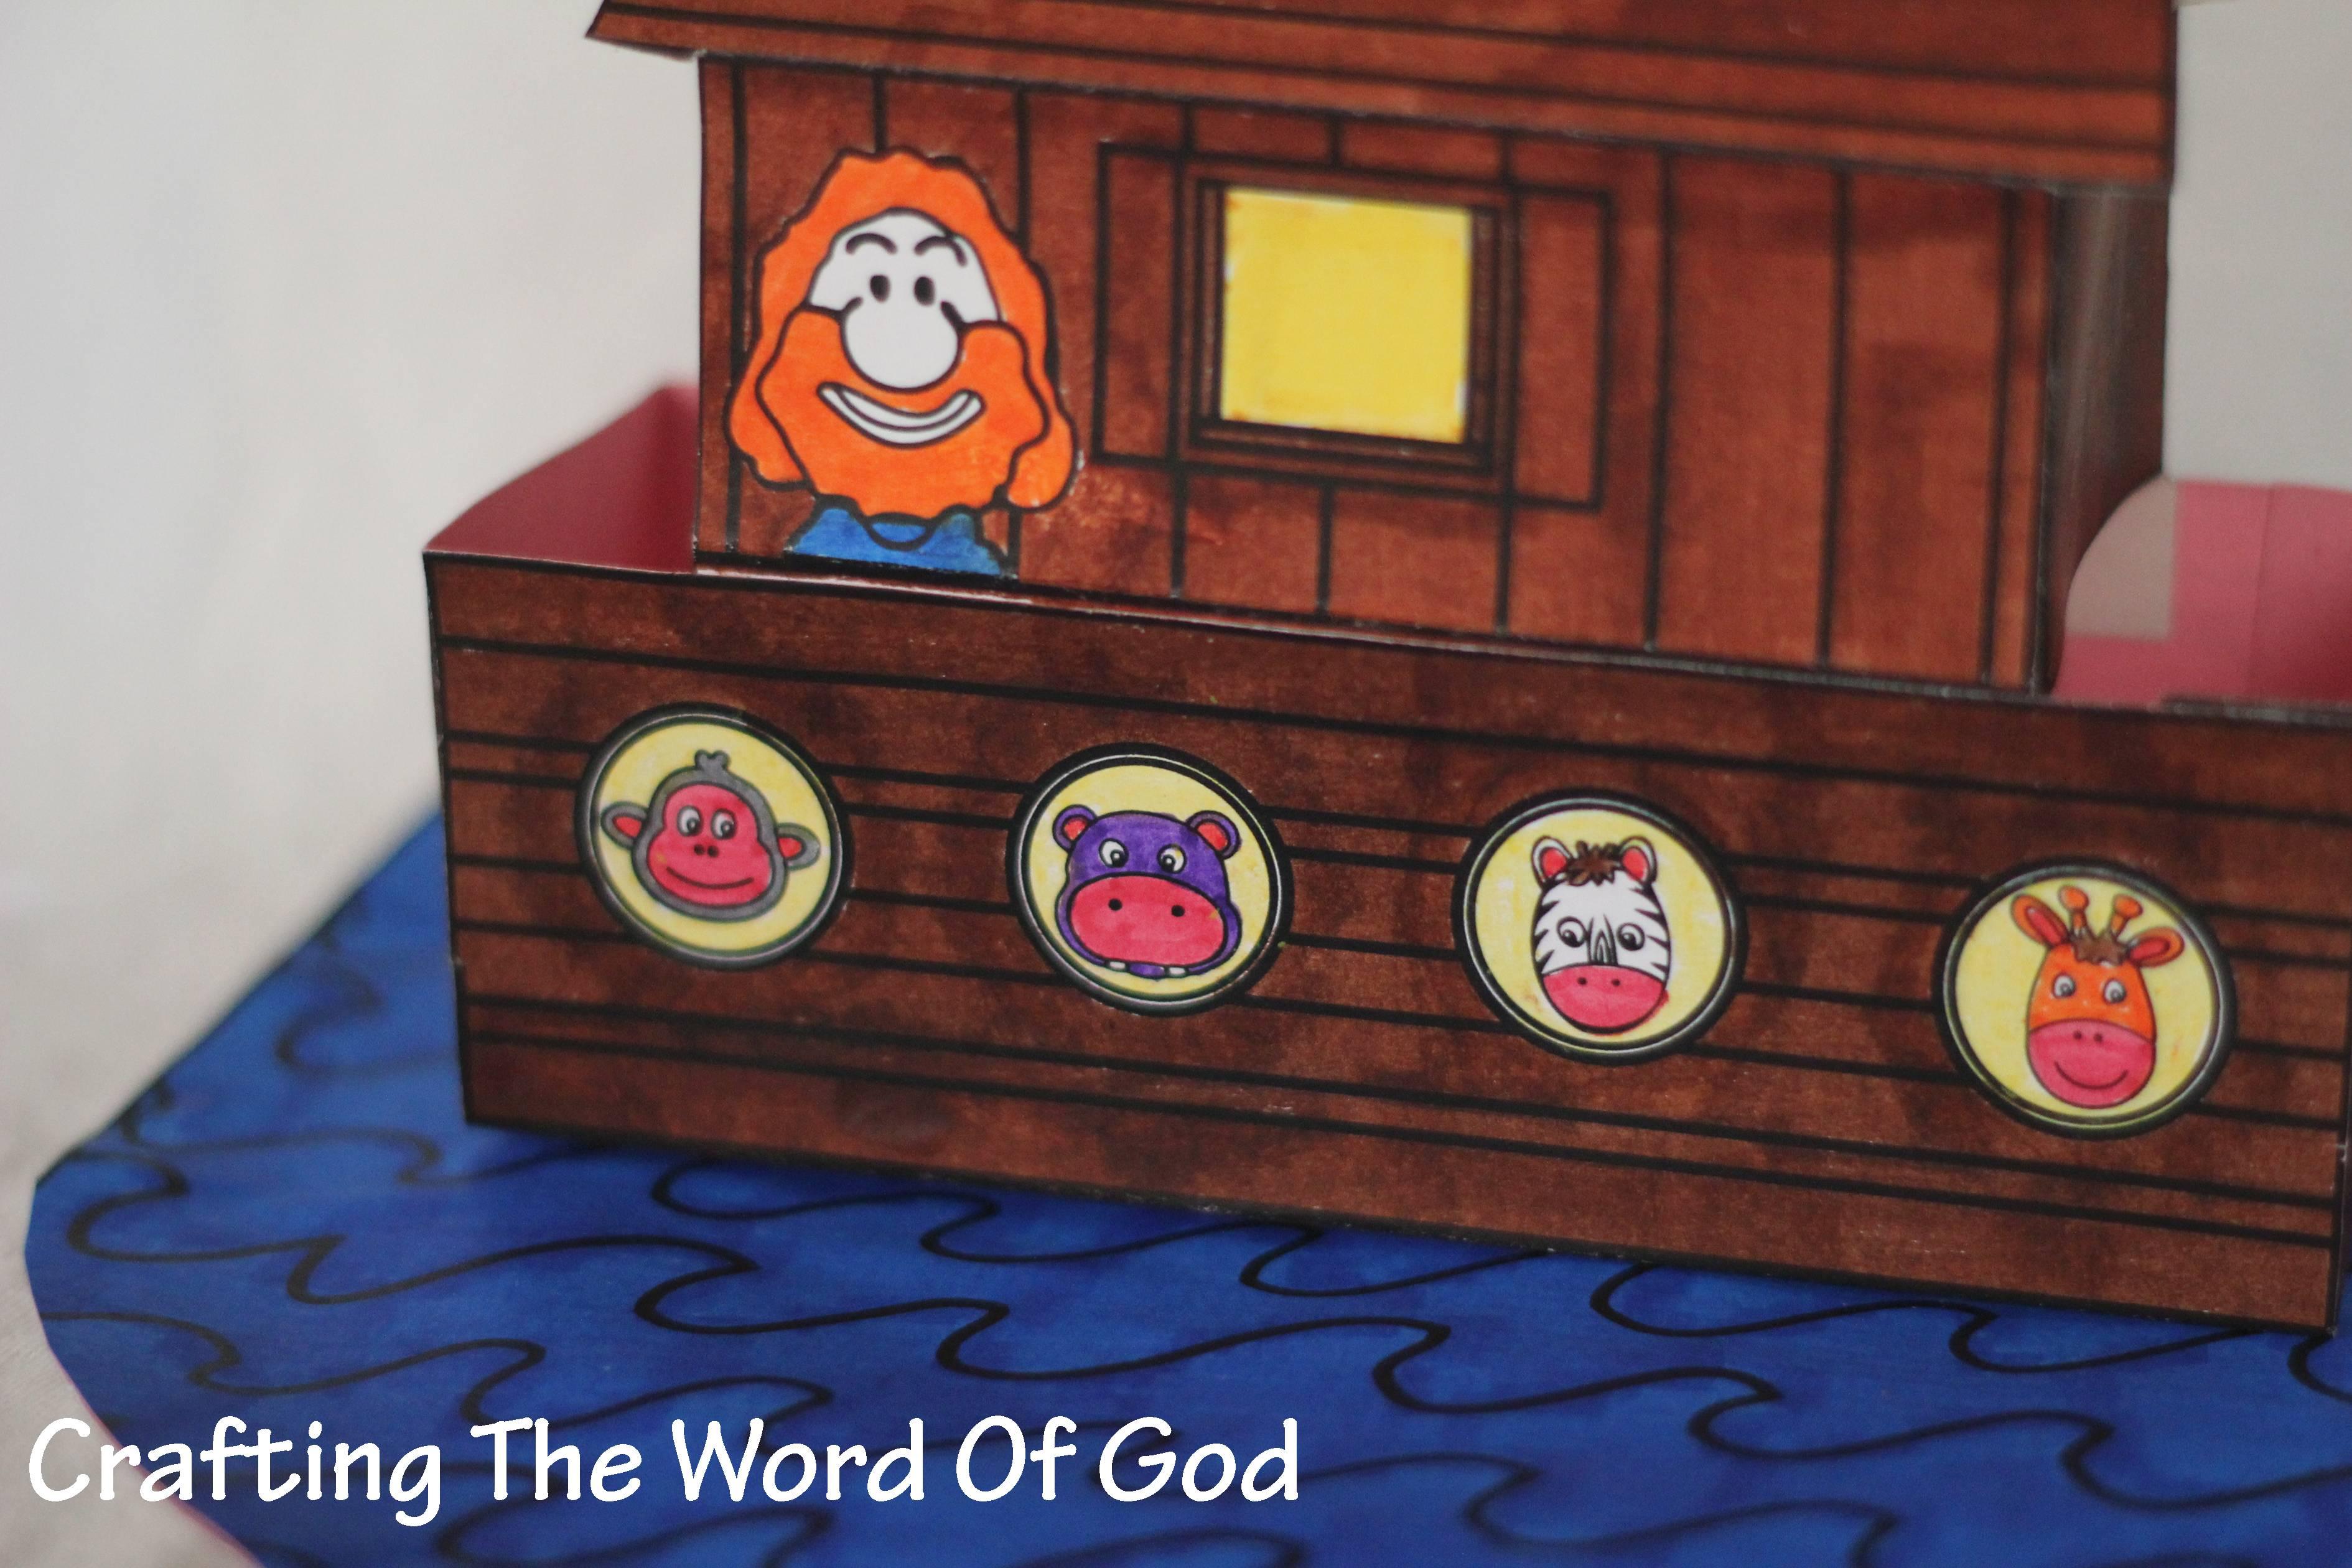 Noahs Ark Crafting The Word Of God